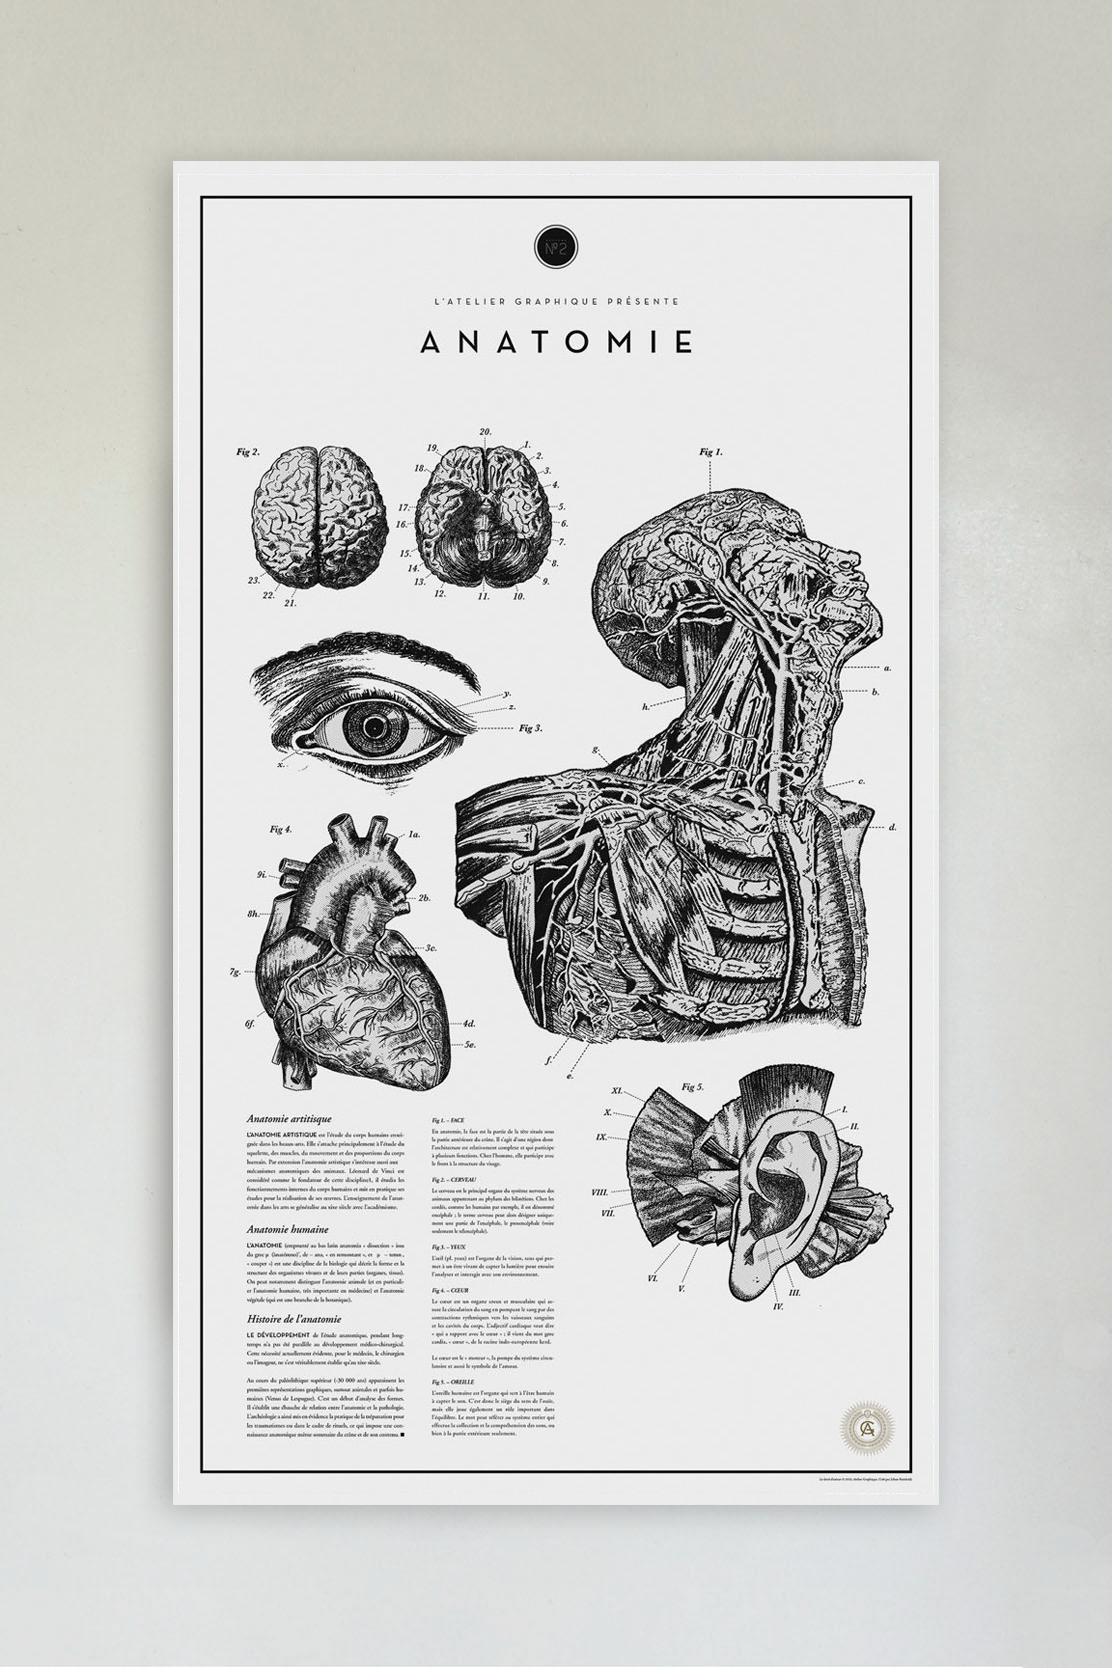 Anatomie No. 2